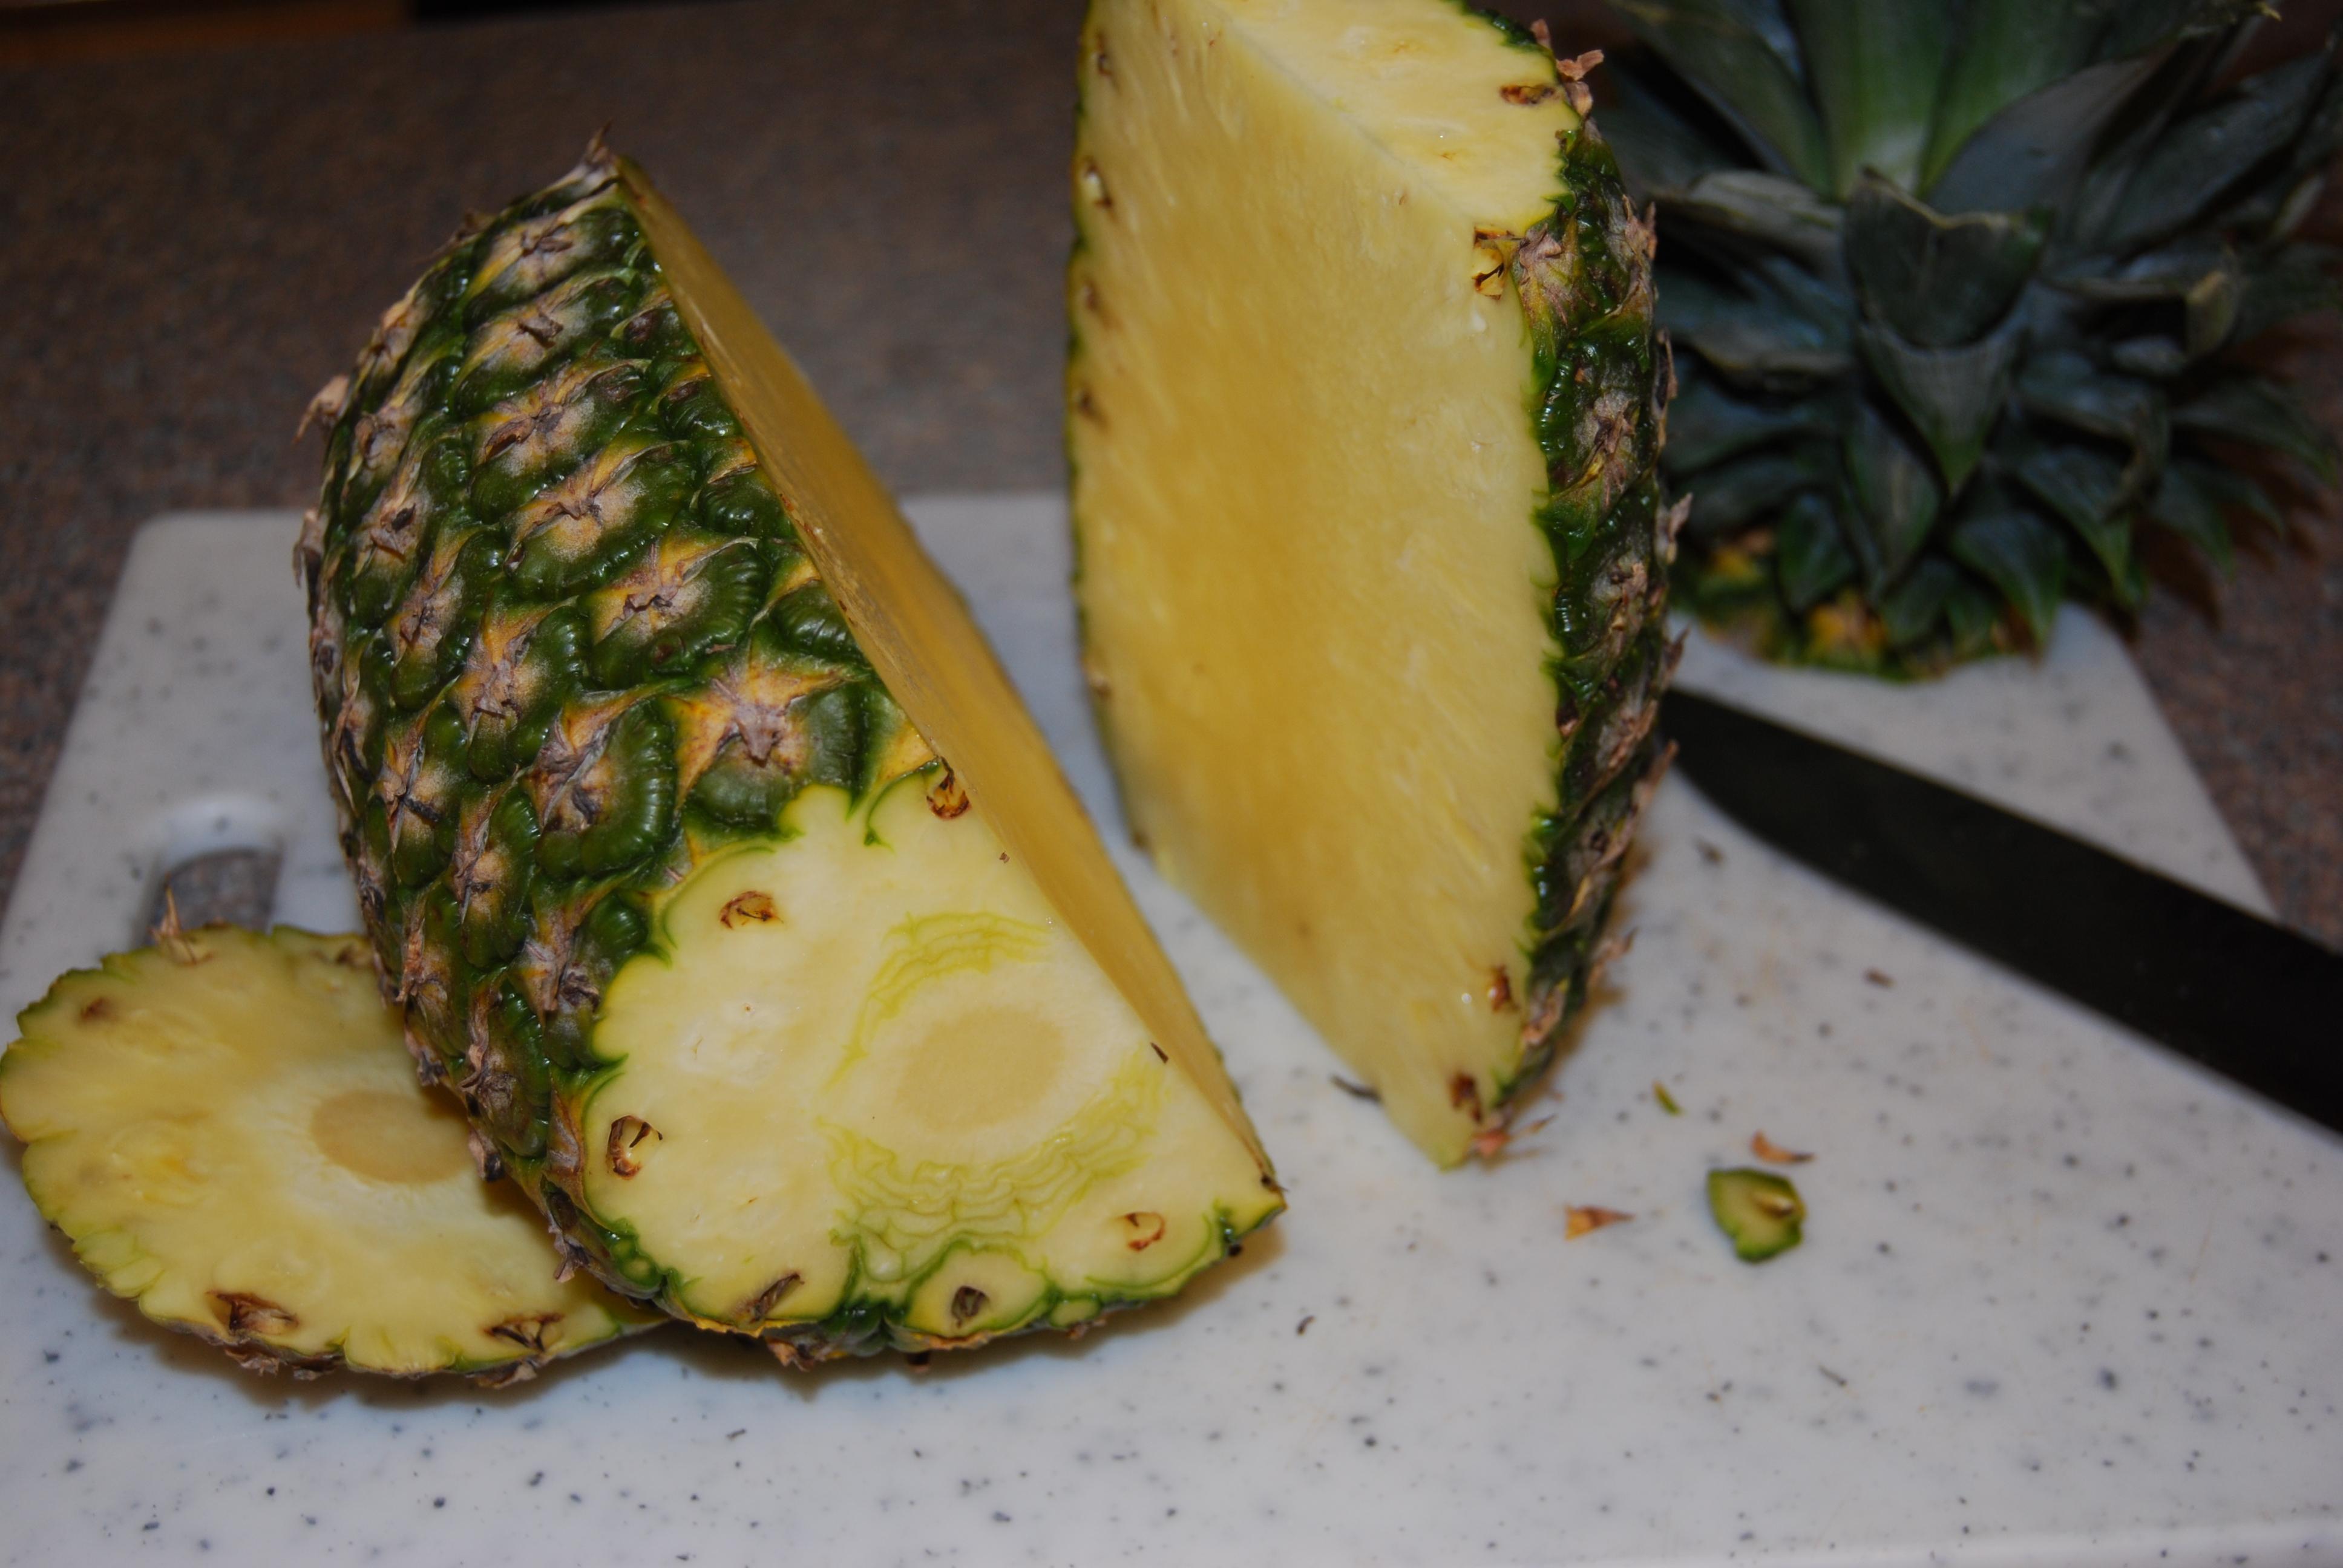 How Do You Cut a Pineapple